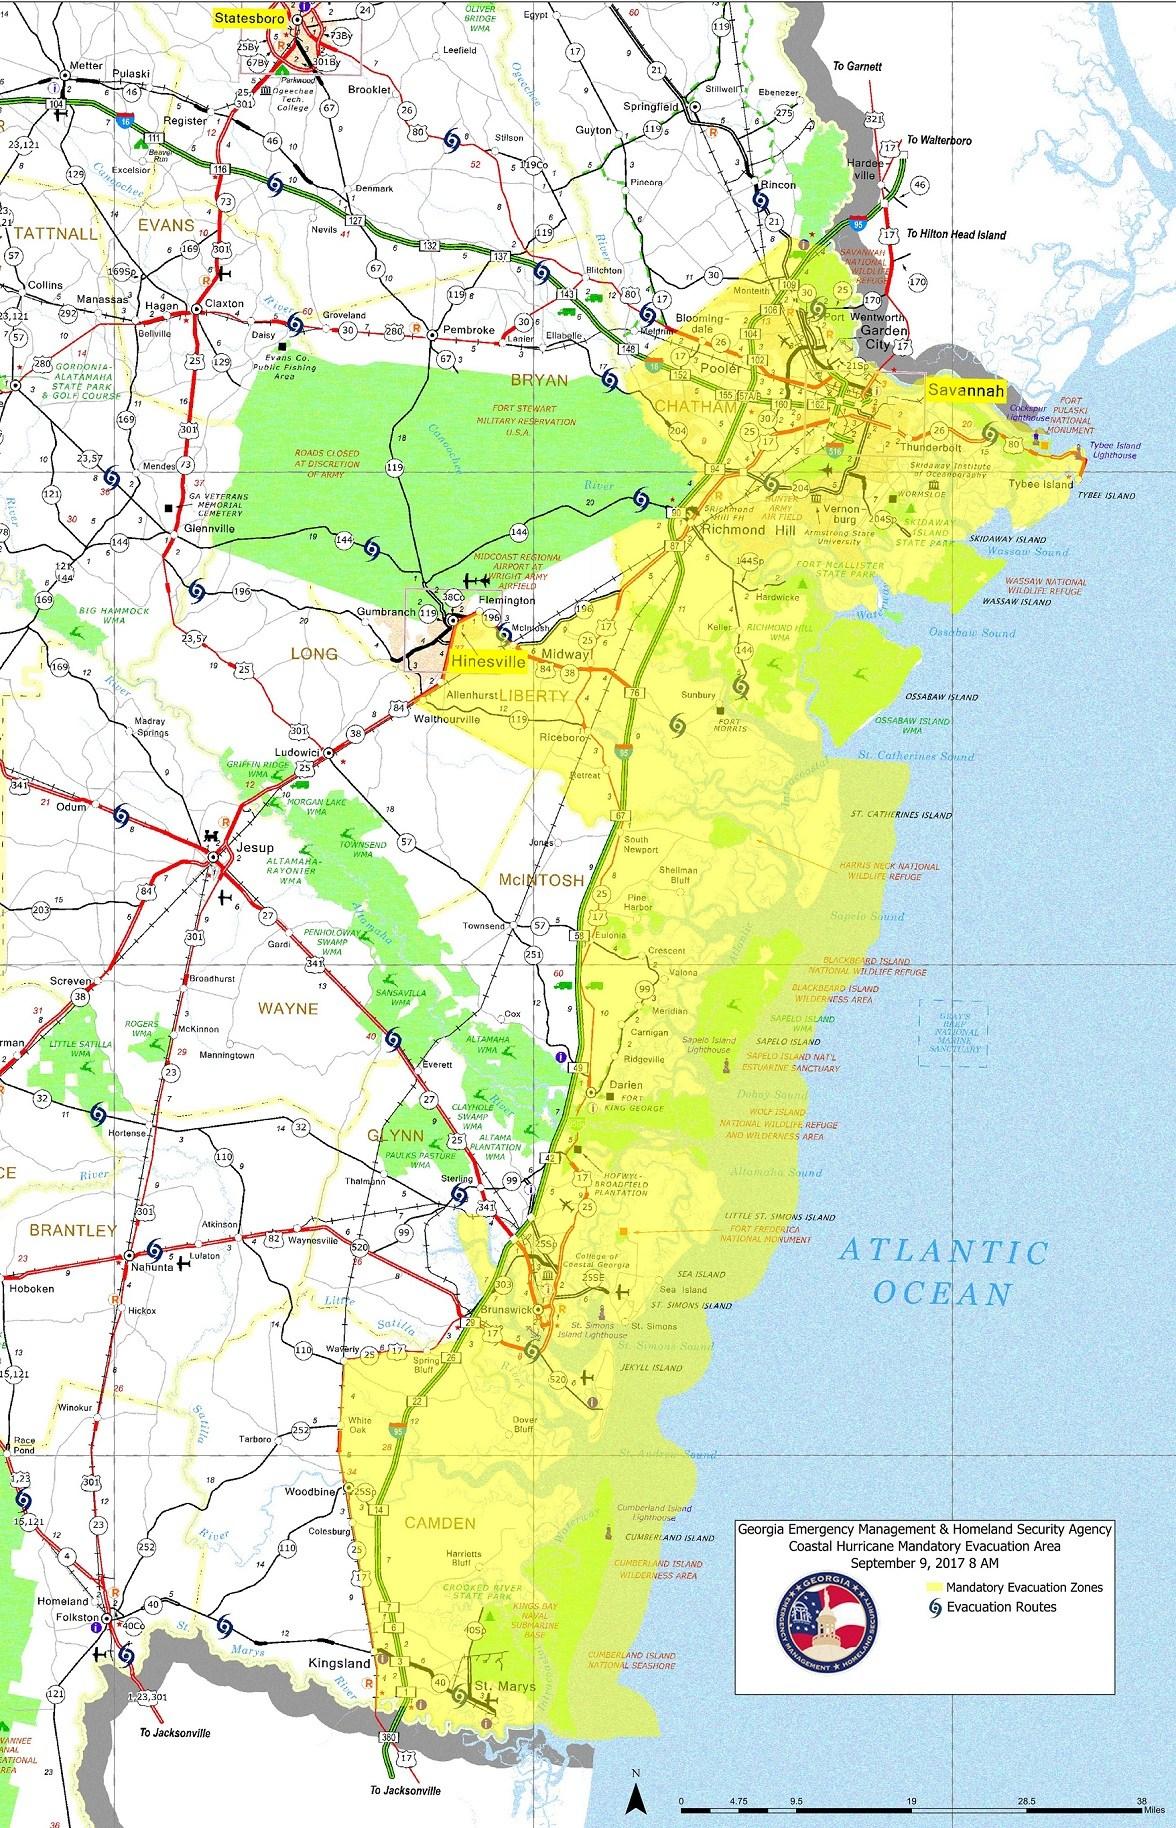 Mandatory Evacuation Zones (Source: Gov. Deals Communication Office)